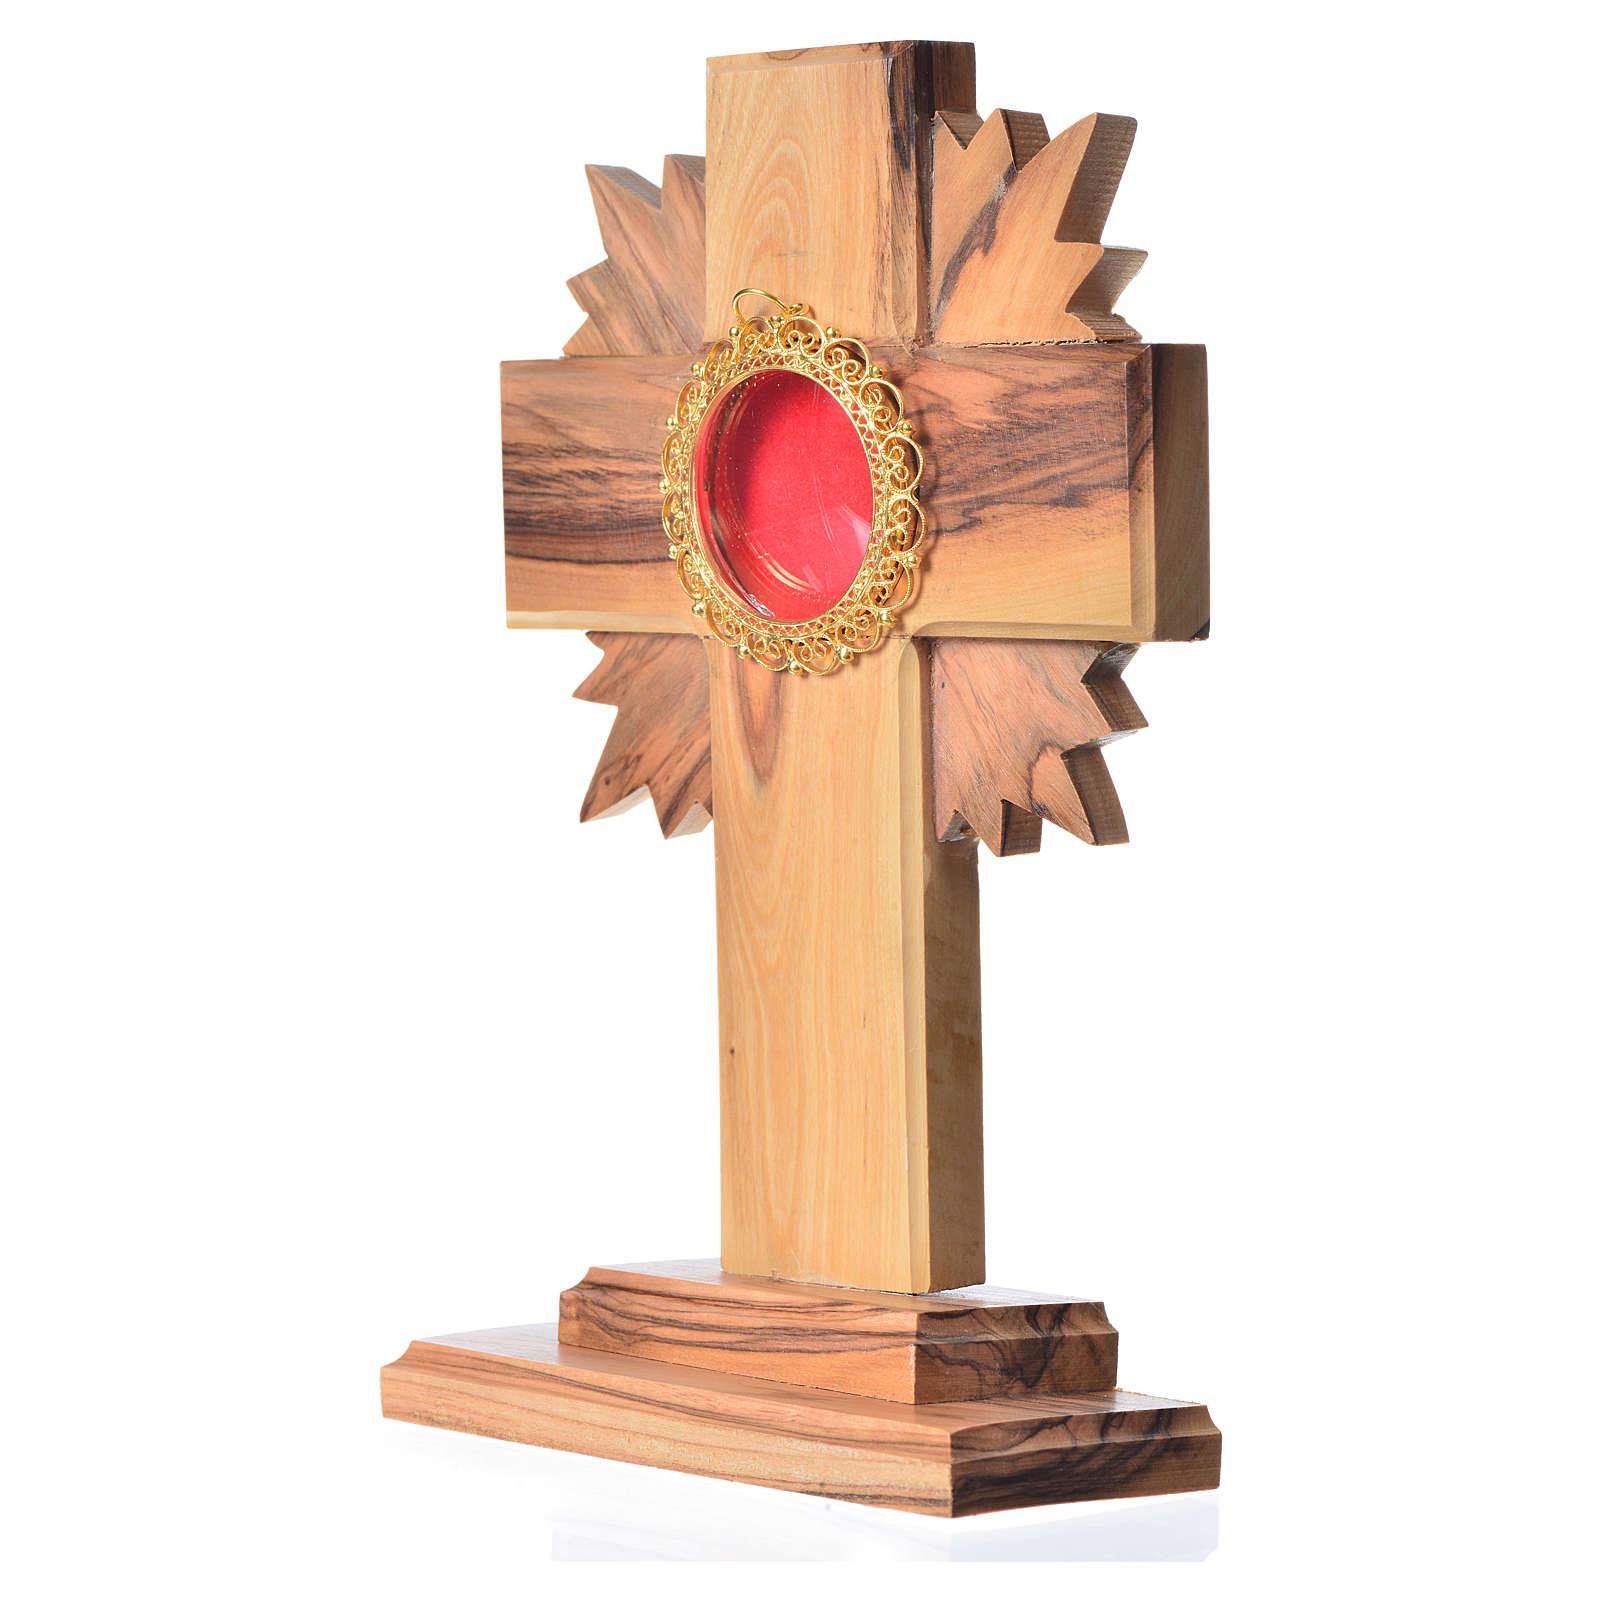 Relicario olivo 15cm, cruz con rayos custodia plata 800 redonda 4